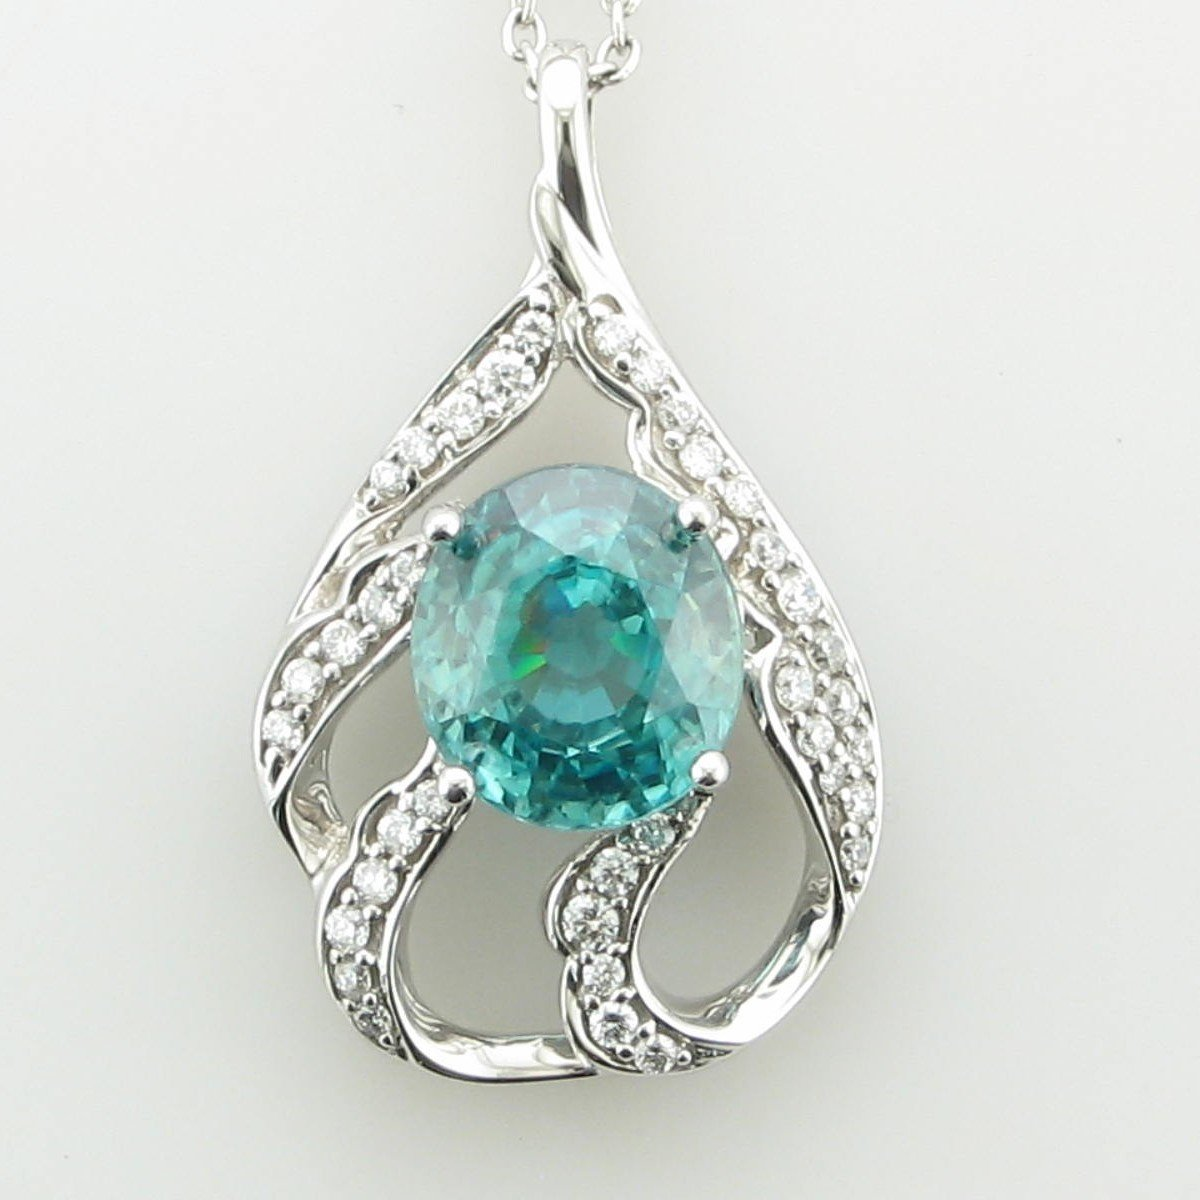 4.43 Carat  Blue Zircon and Diamond Pendant set in 18 Karat  White Gold